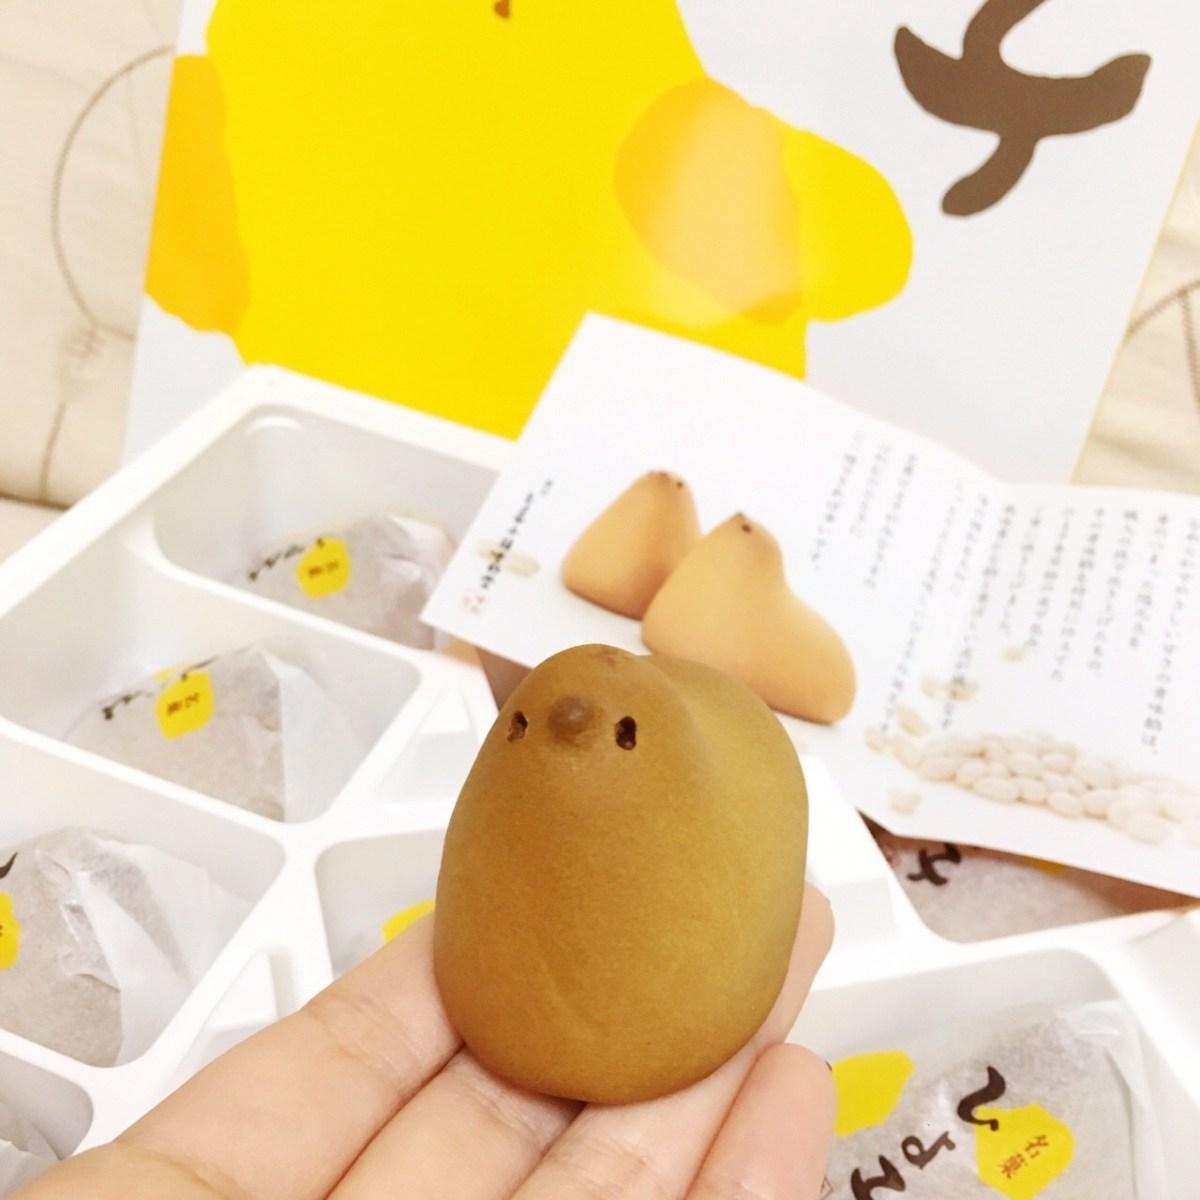 Cemilan Wajib Di Kota Tokyo, Salah Satunya Ada Yang Berbentuk Anak Ayam Loh !